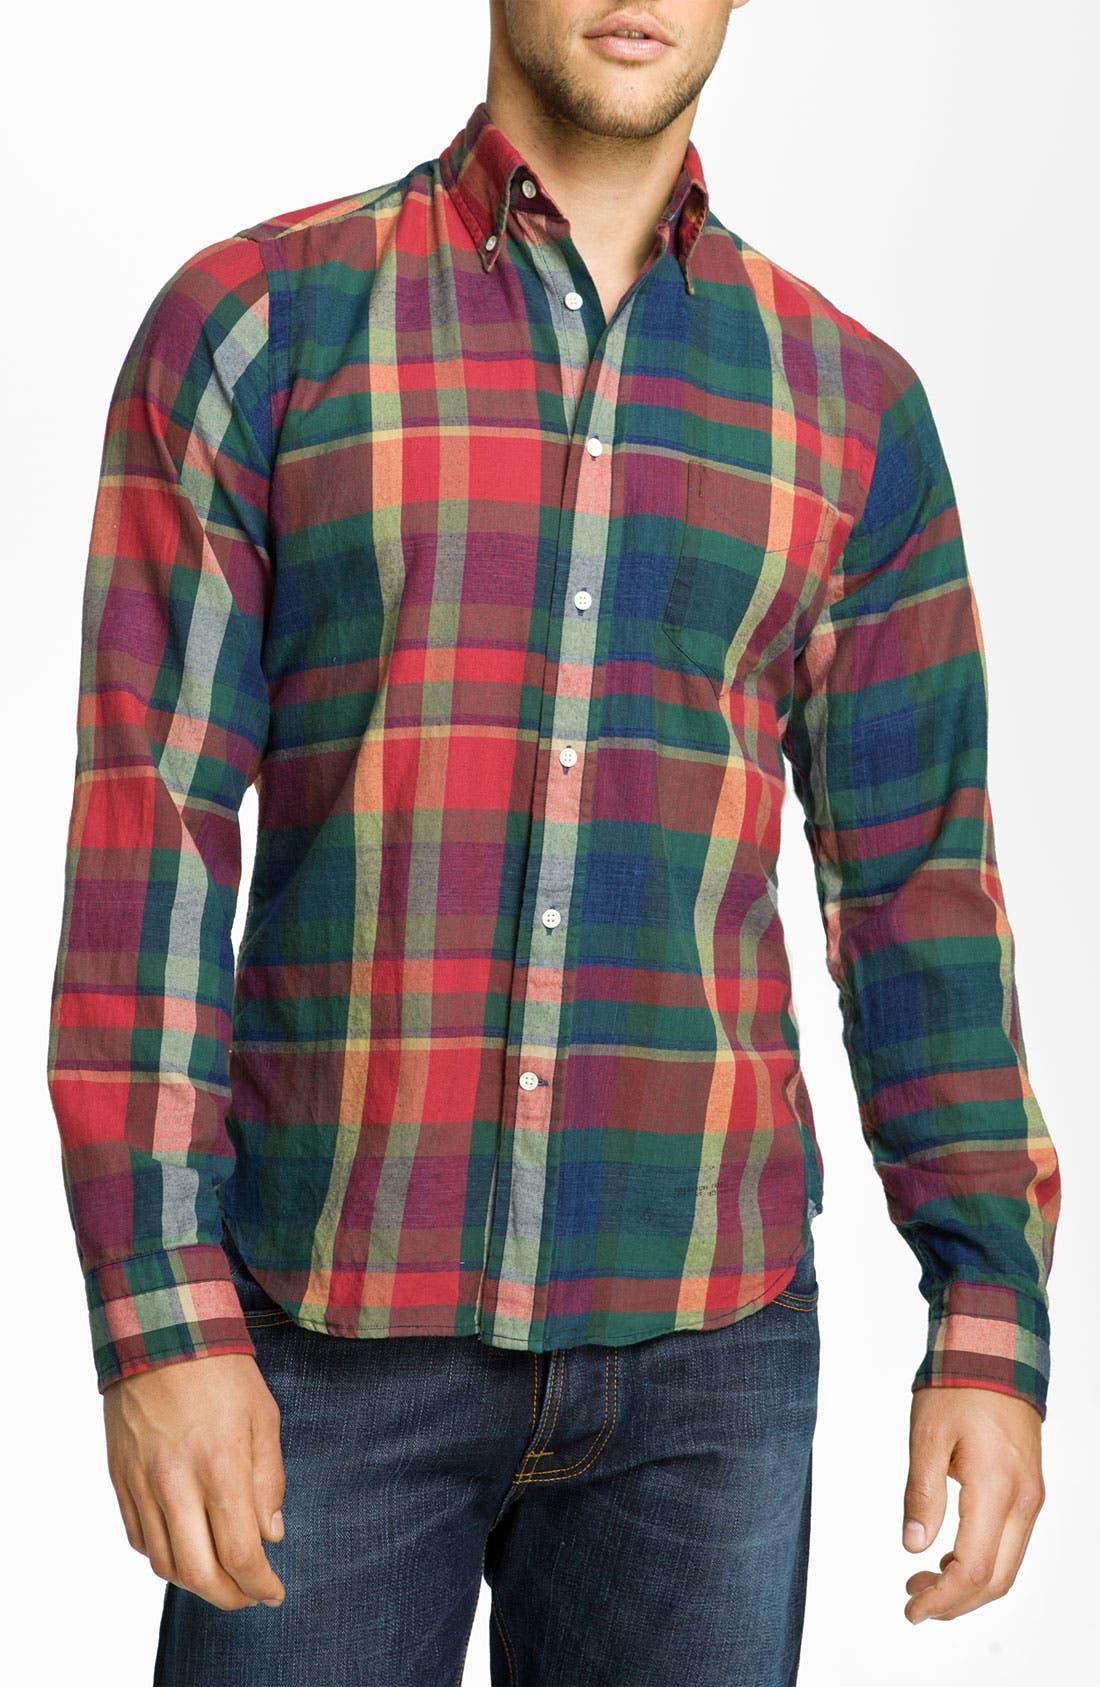 Alternate Image 1 Selected - Gant Rugger 'Indigo' Plaid Woven Shirt